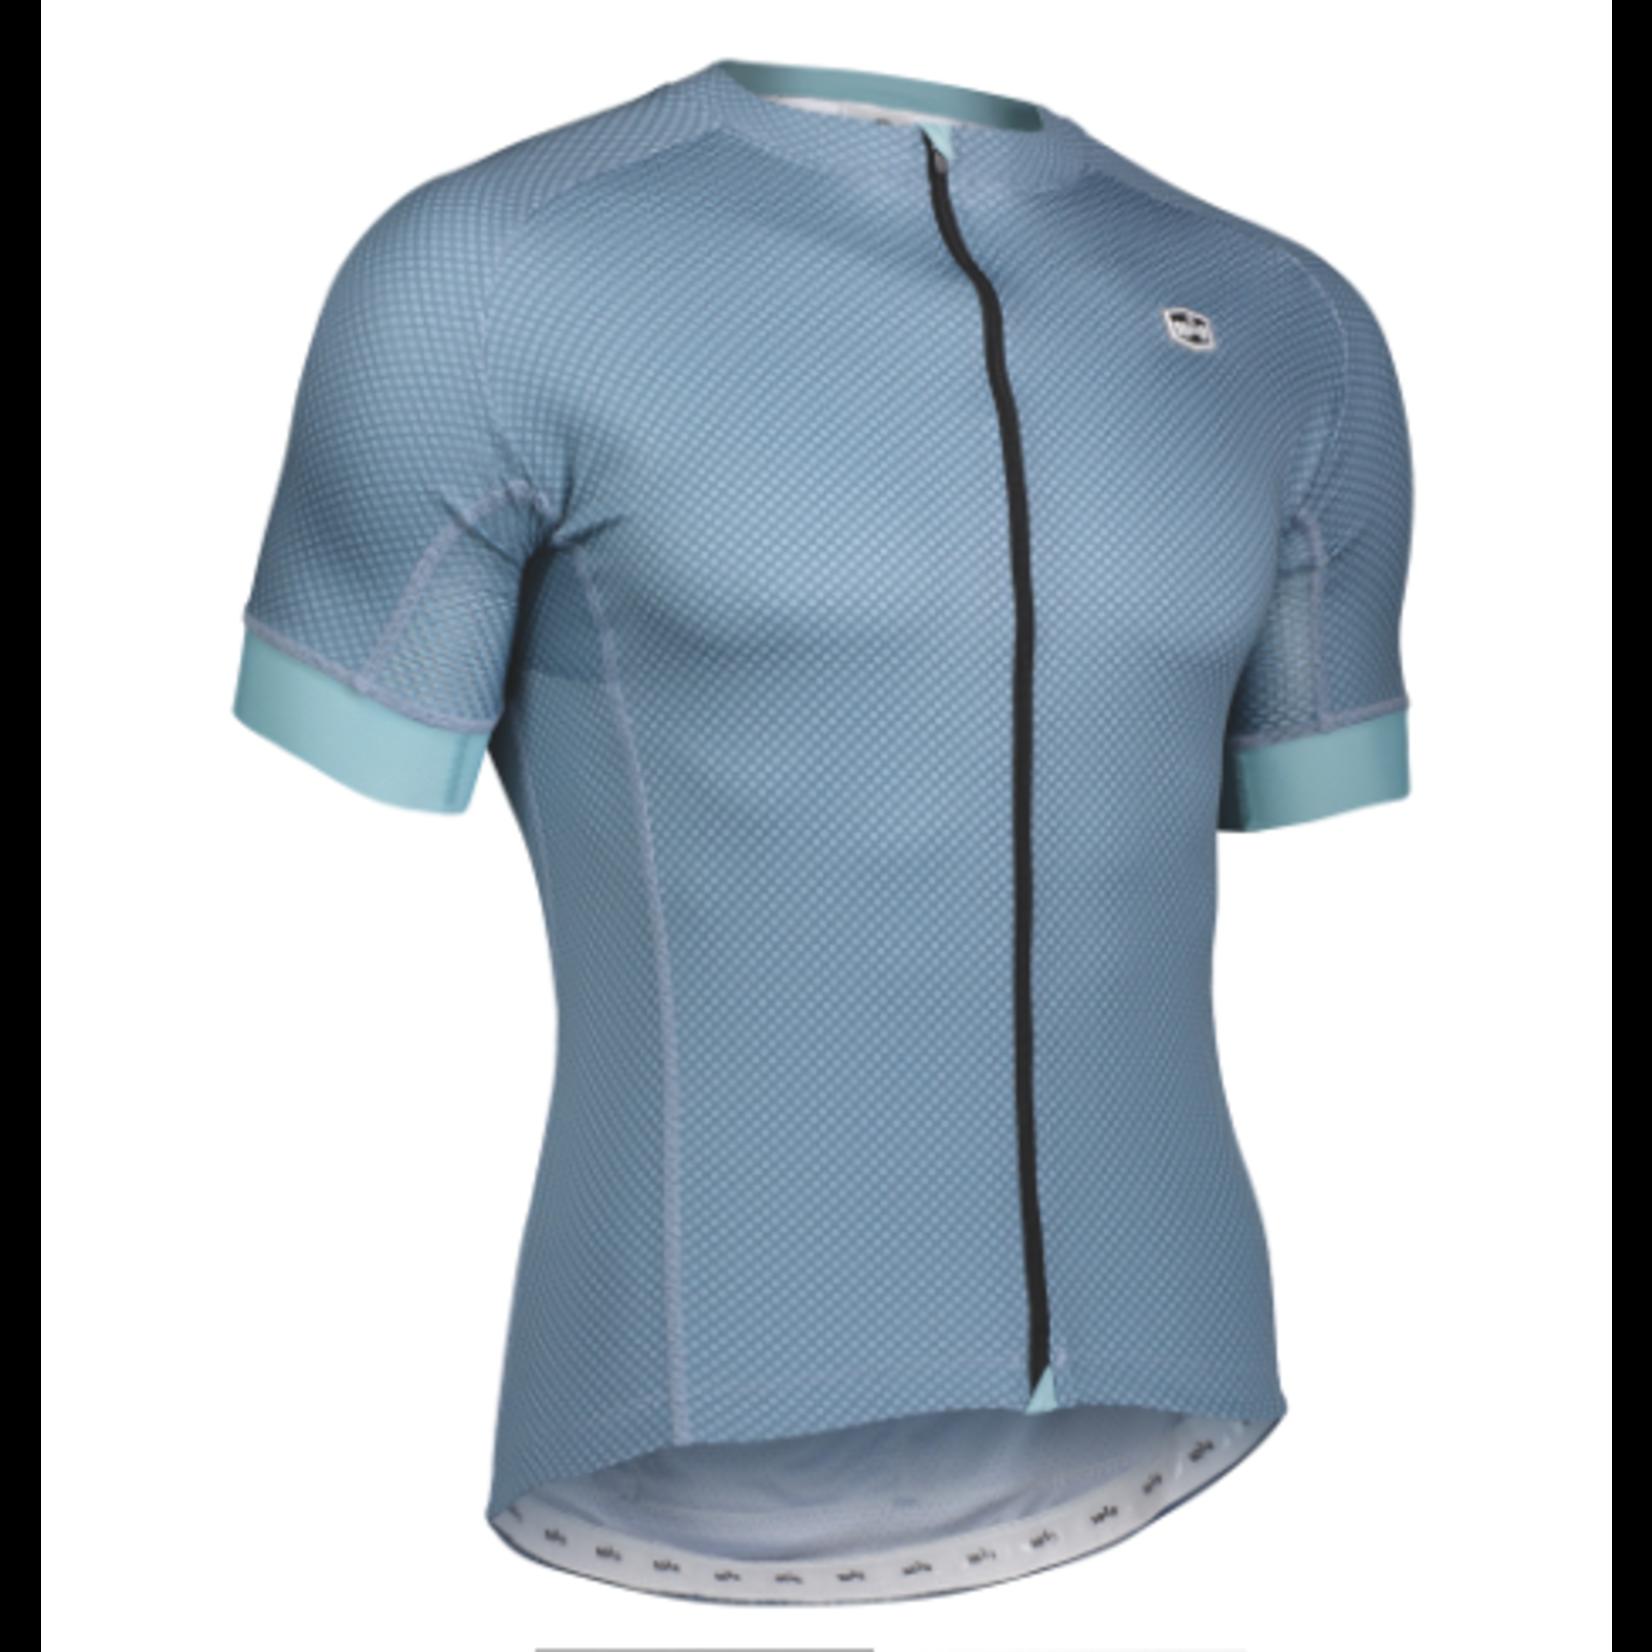 SOLO Solo Omni MK3 Mens Cycling Jersey Grey Blue